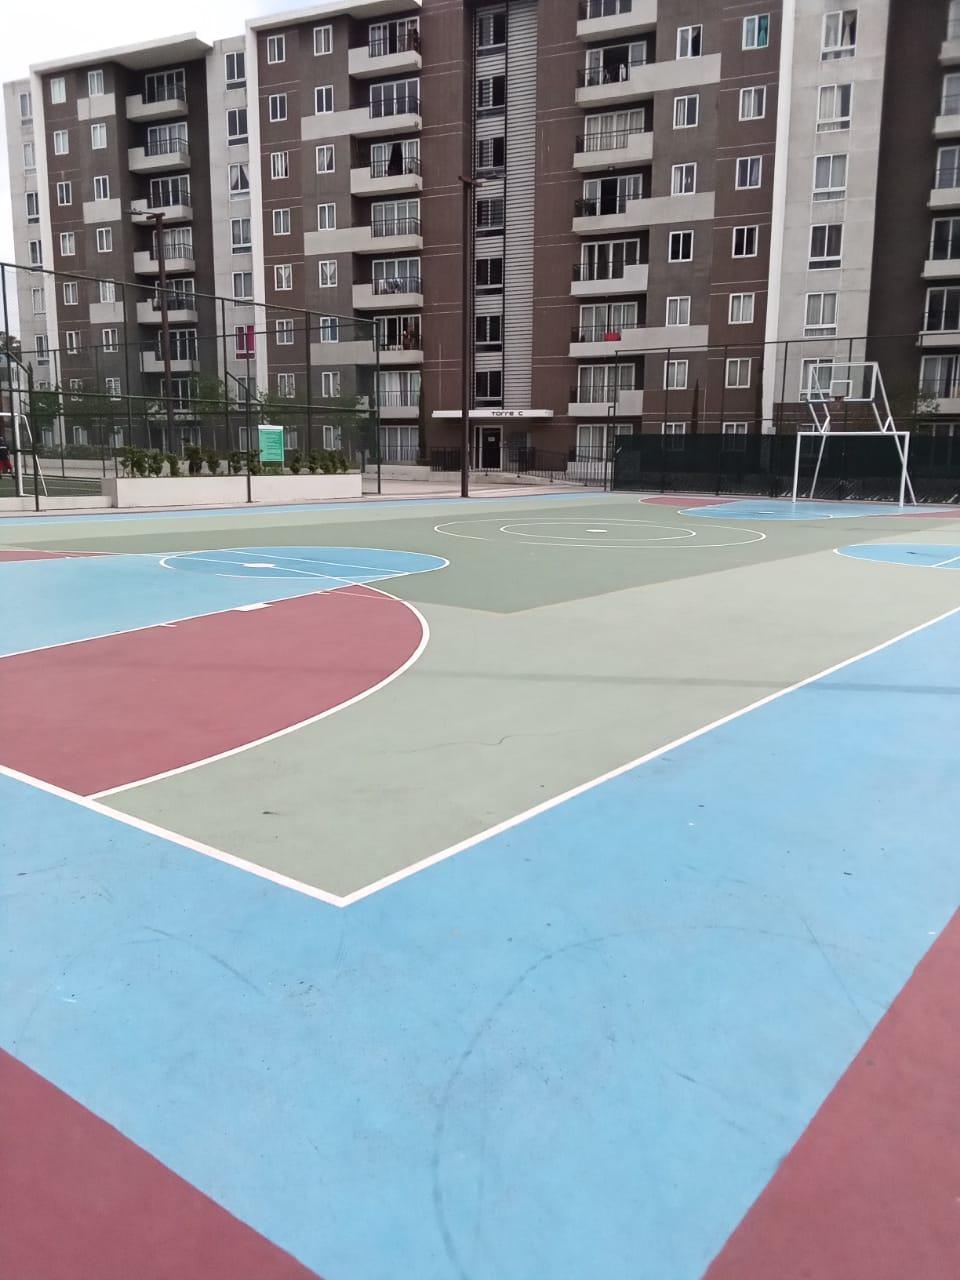 Venta apartamento en Parque 7 nivel alto, zona 7 Mixco